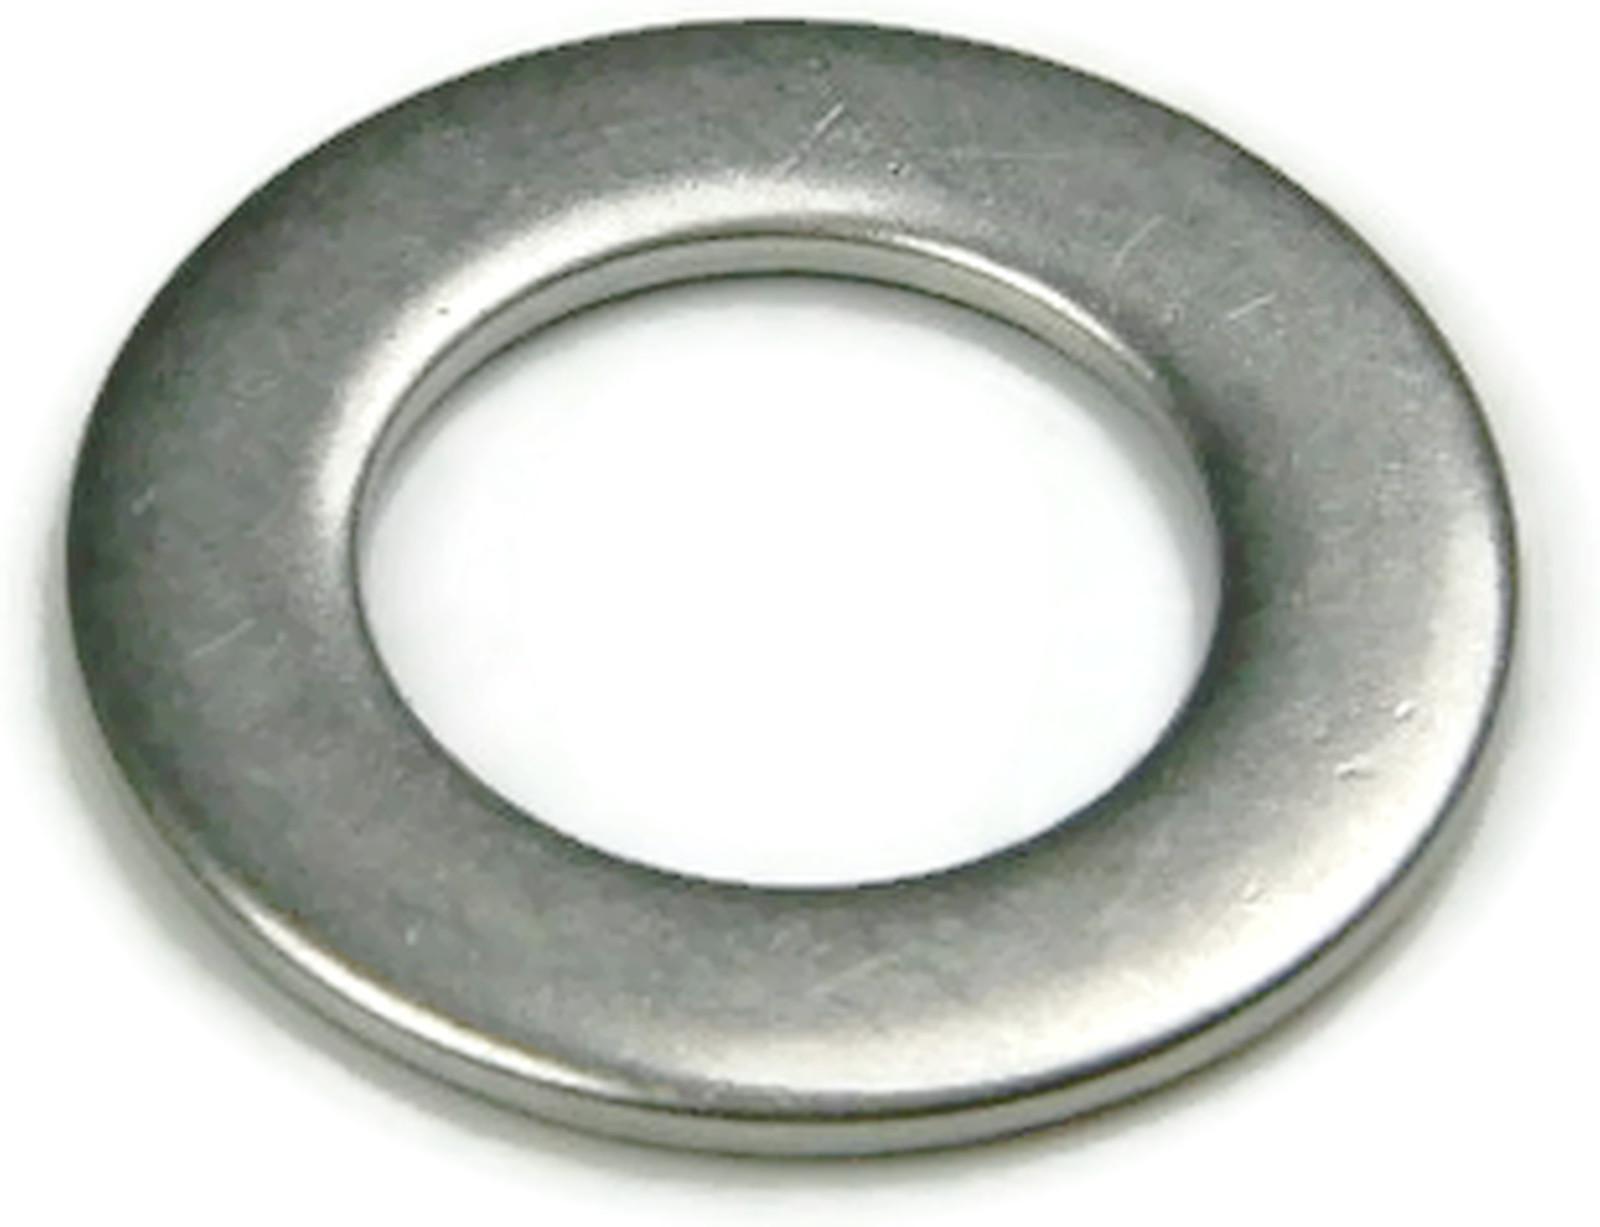 Stainless Steel Flat Washer Series 9C616 3//8 ID x .625 OD x 1//16 THK Qty 250